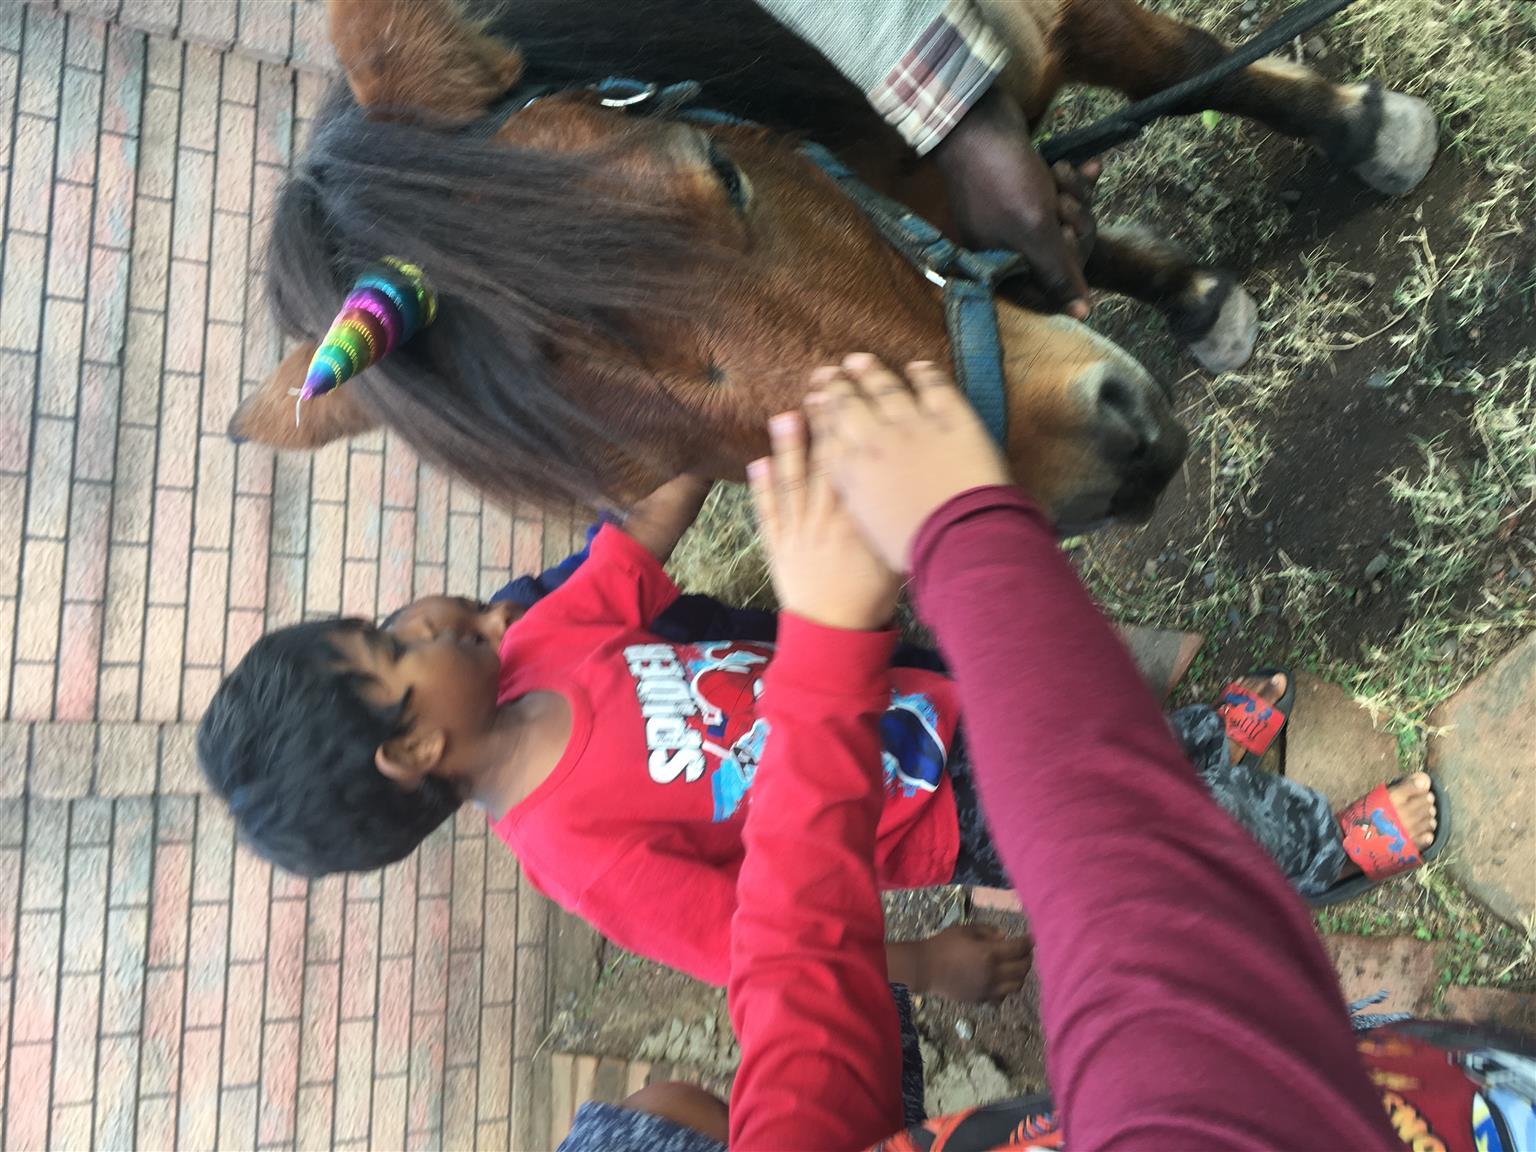 Party pony rides